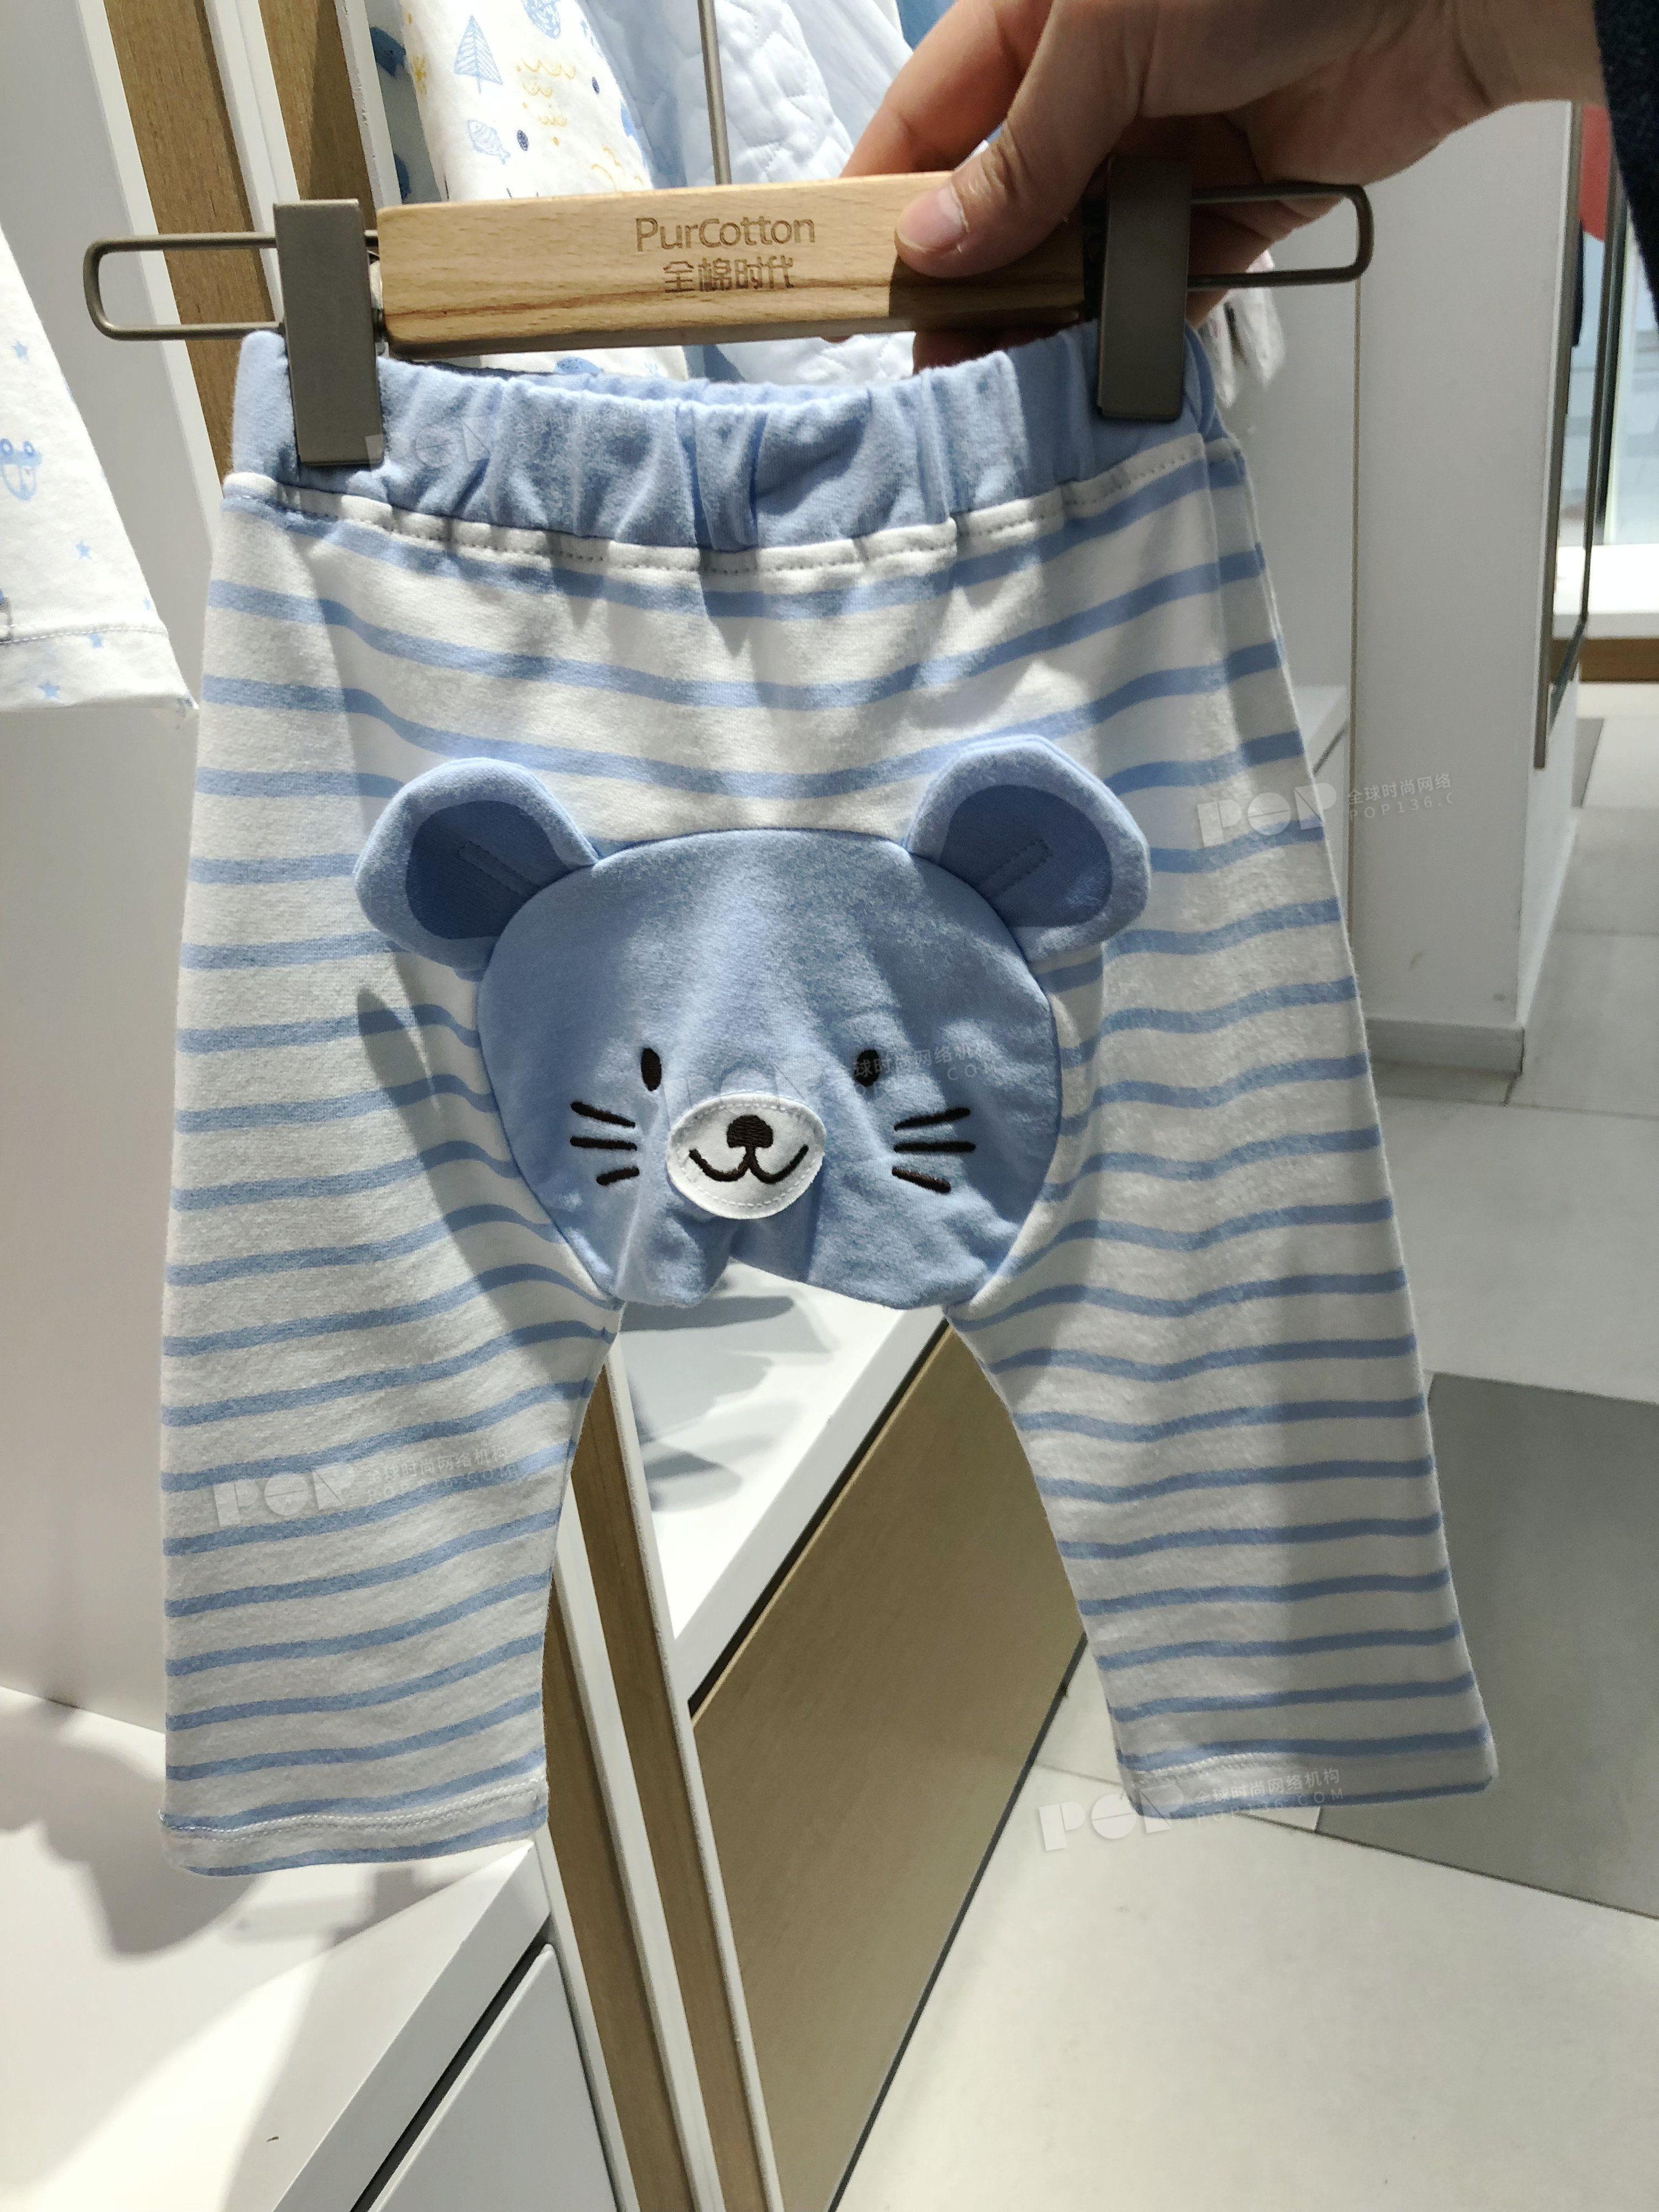 2018ssshanghaiboys Loungewear Loungewearpurcotton Geometry Stripe Animal Fashion Design Kids Prints Baby Boy Outfits Fashion Forecasting